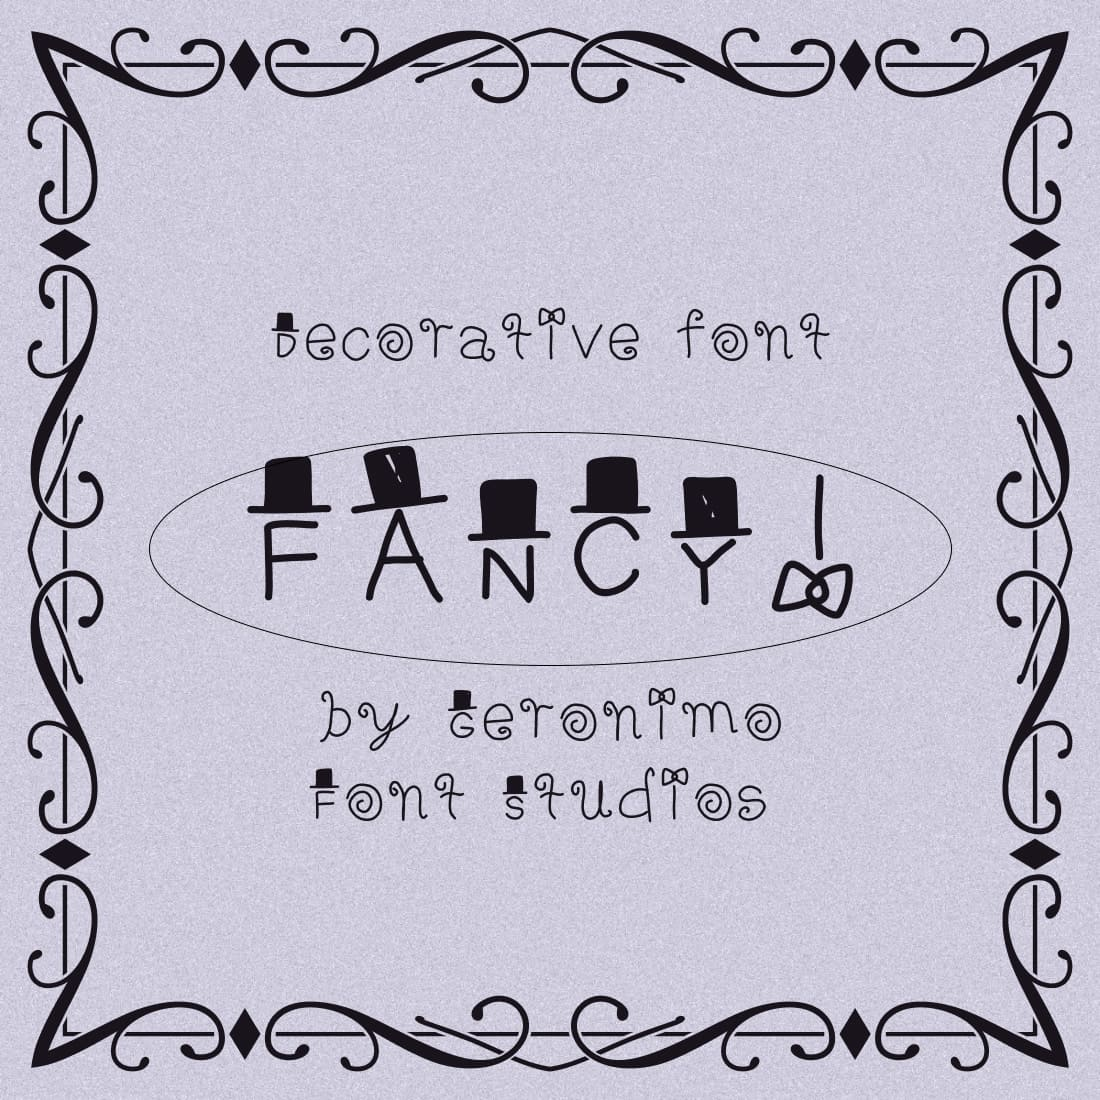 Decorative Free Fancy Font Preview by MasterBundles.